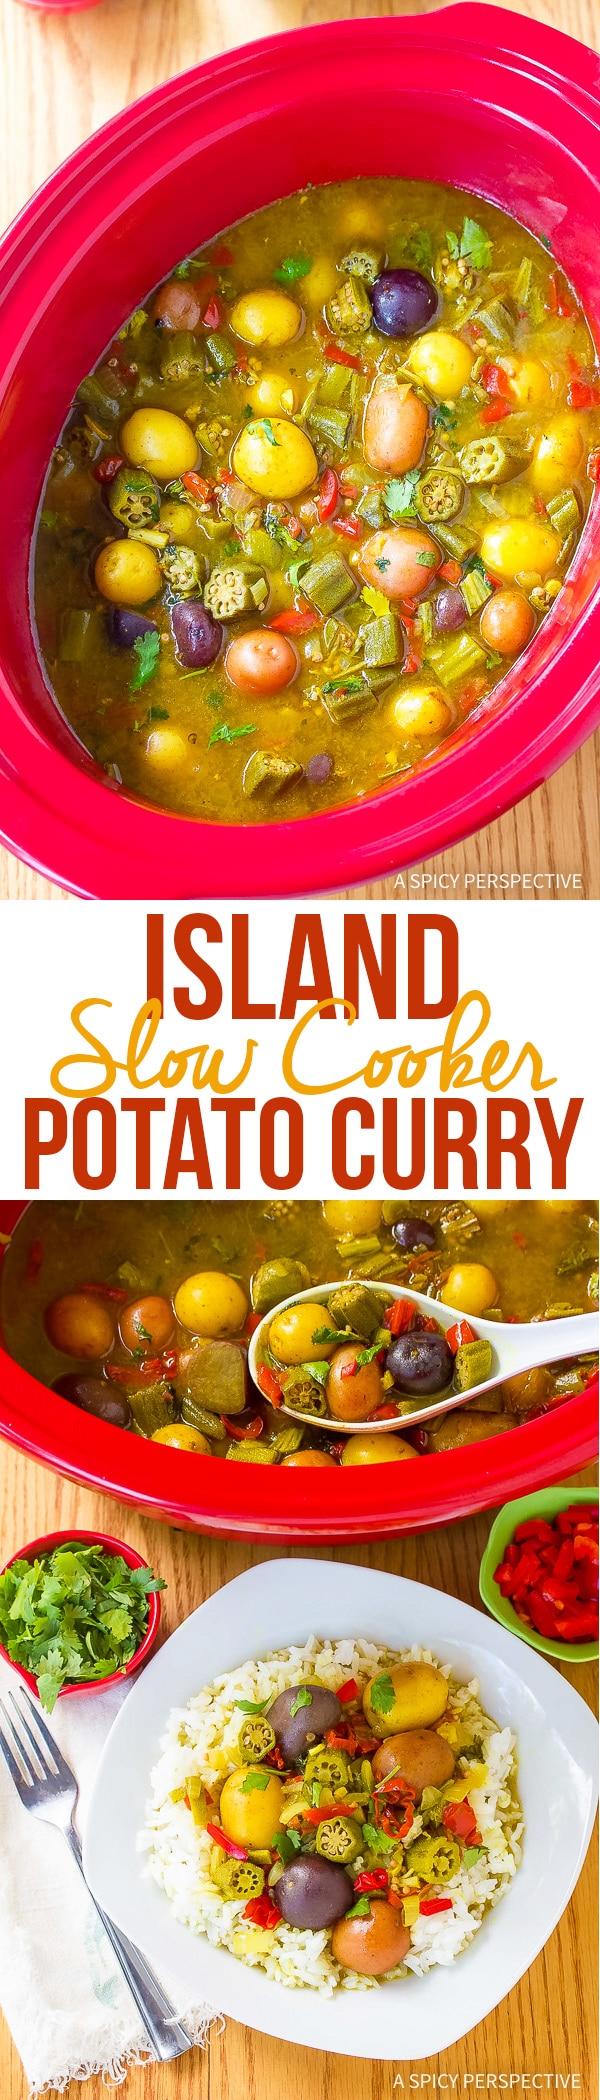 Island Slow Cooker Potato Curry Recipe (Vegetarian!)